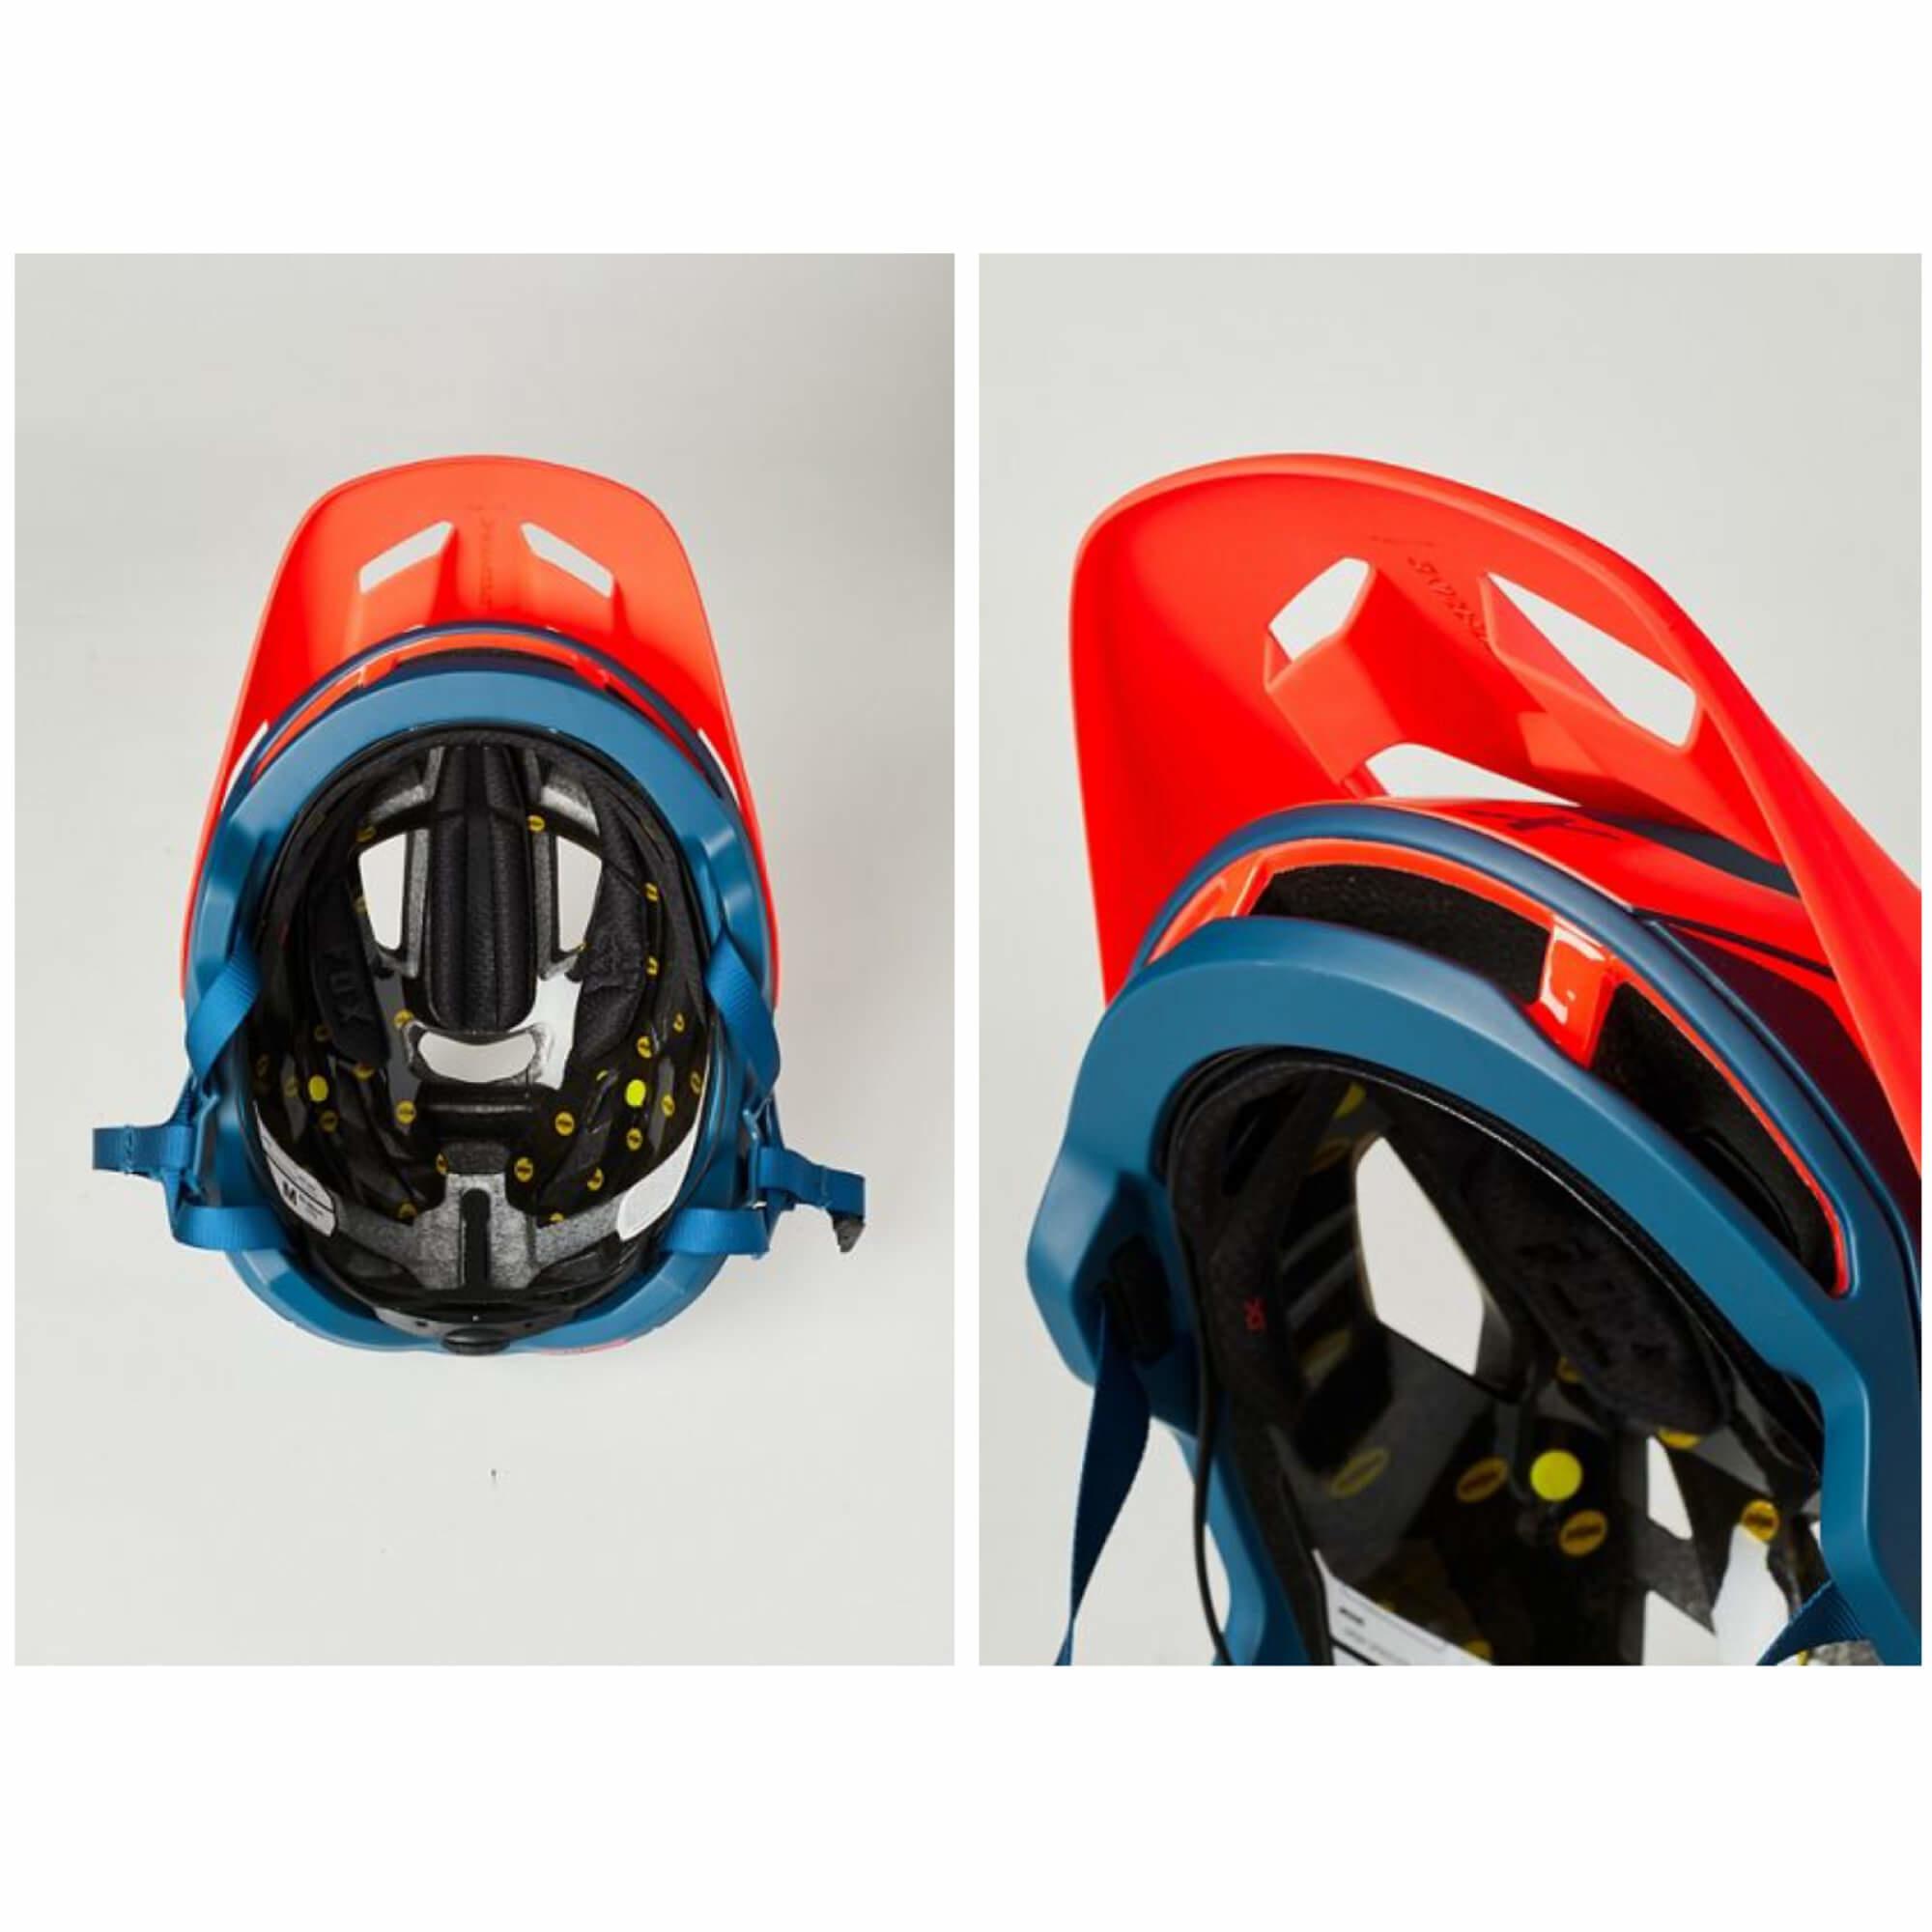 Speedframe Pro Helmet Repeater, As-4